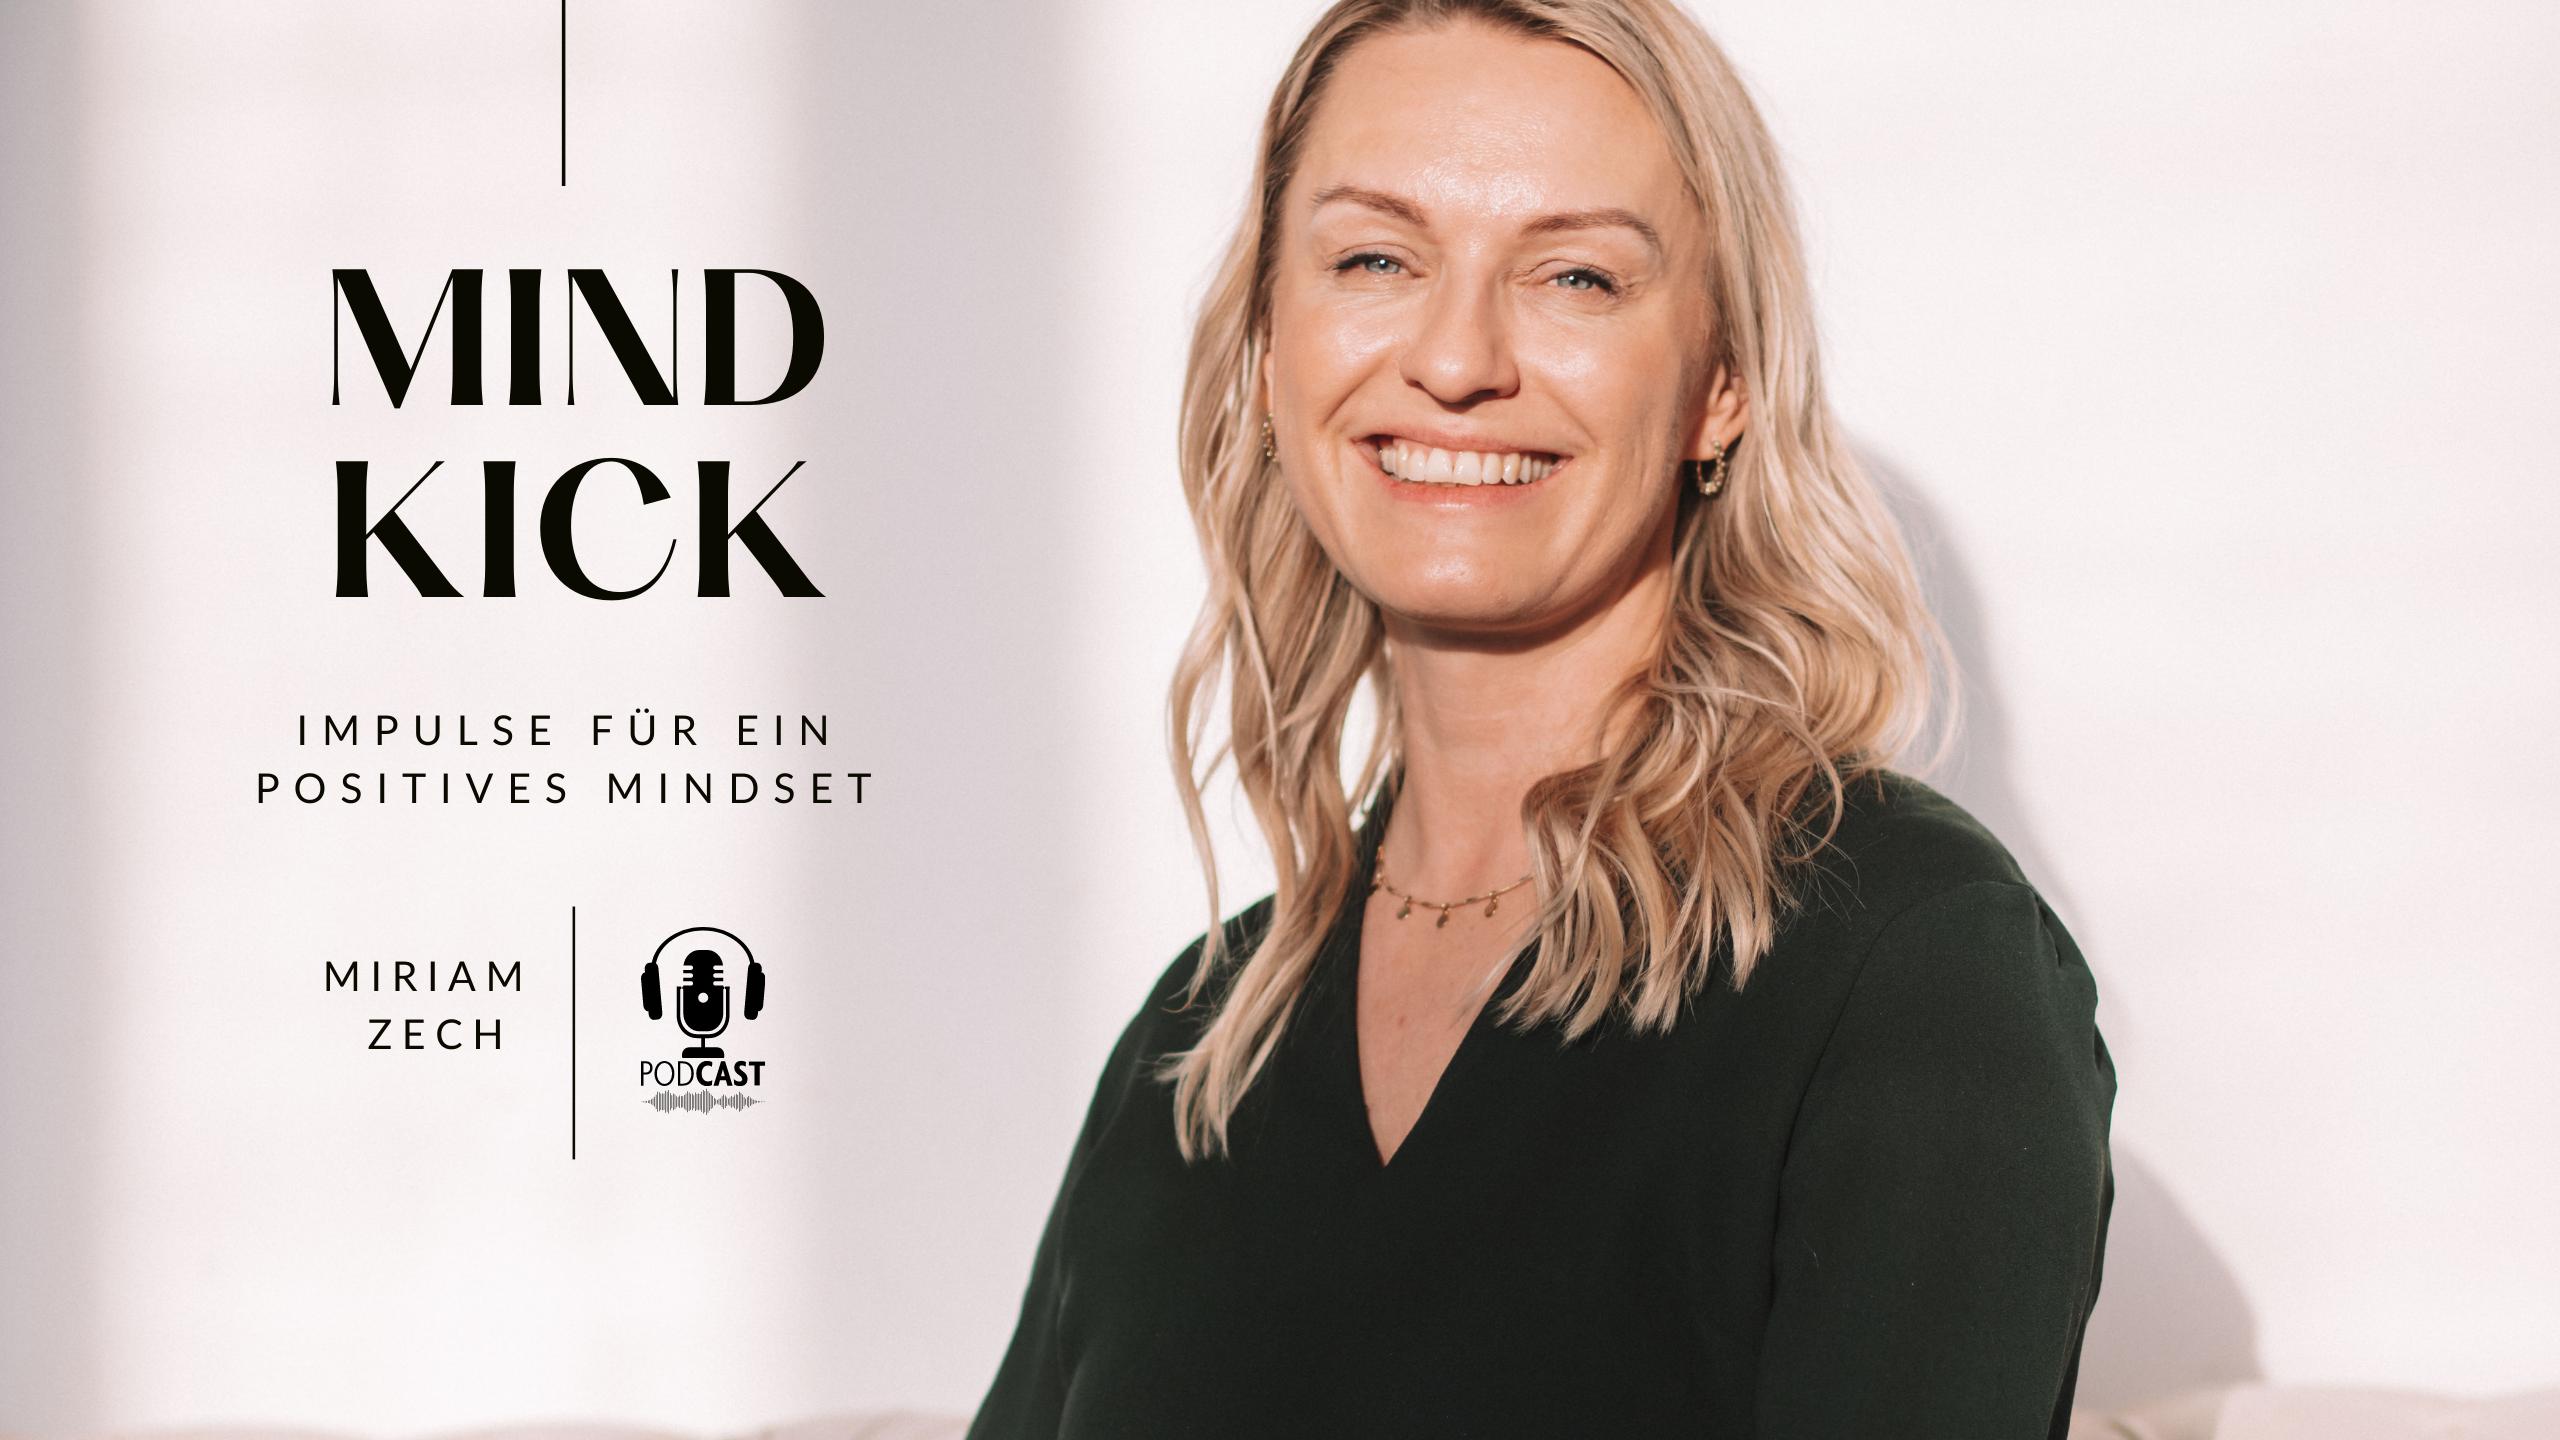 Podcast by Miriam Zech